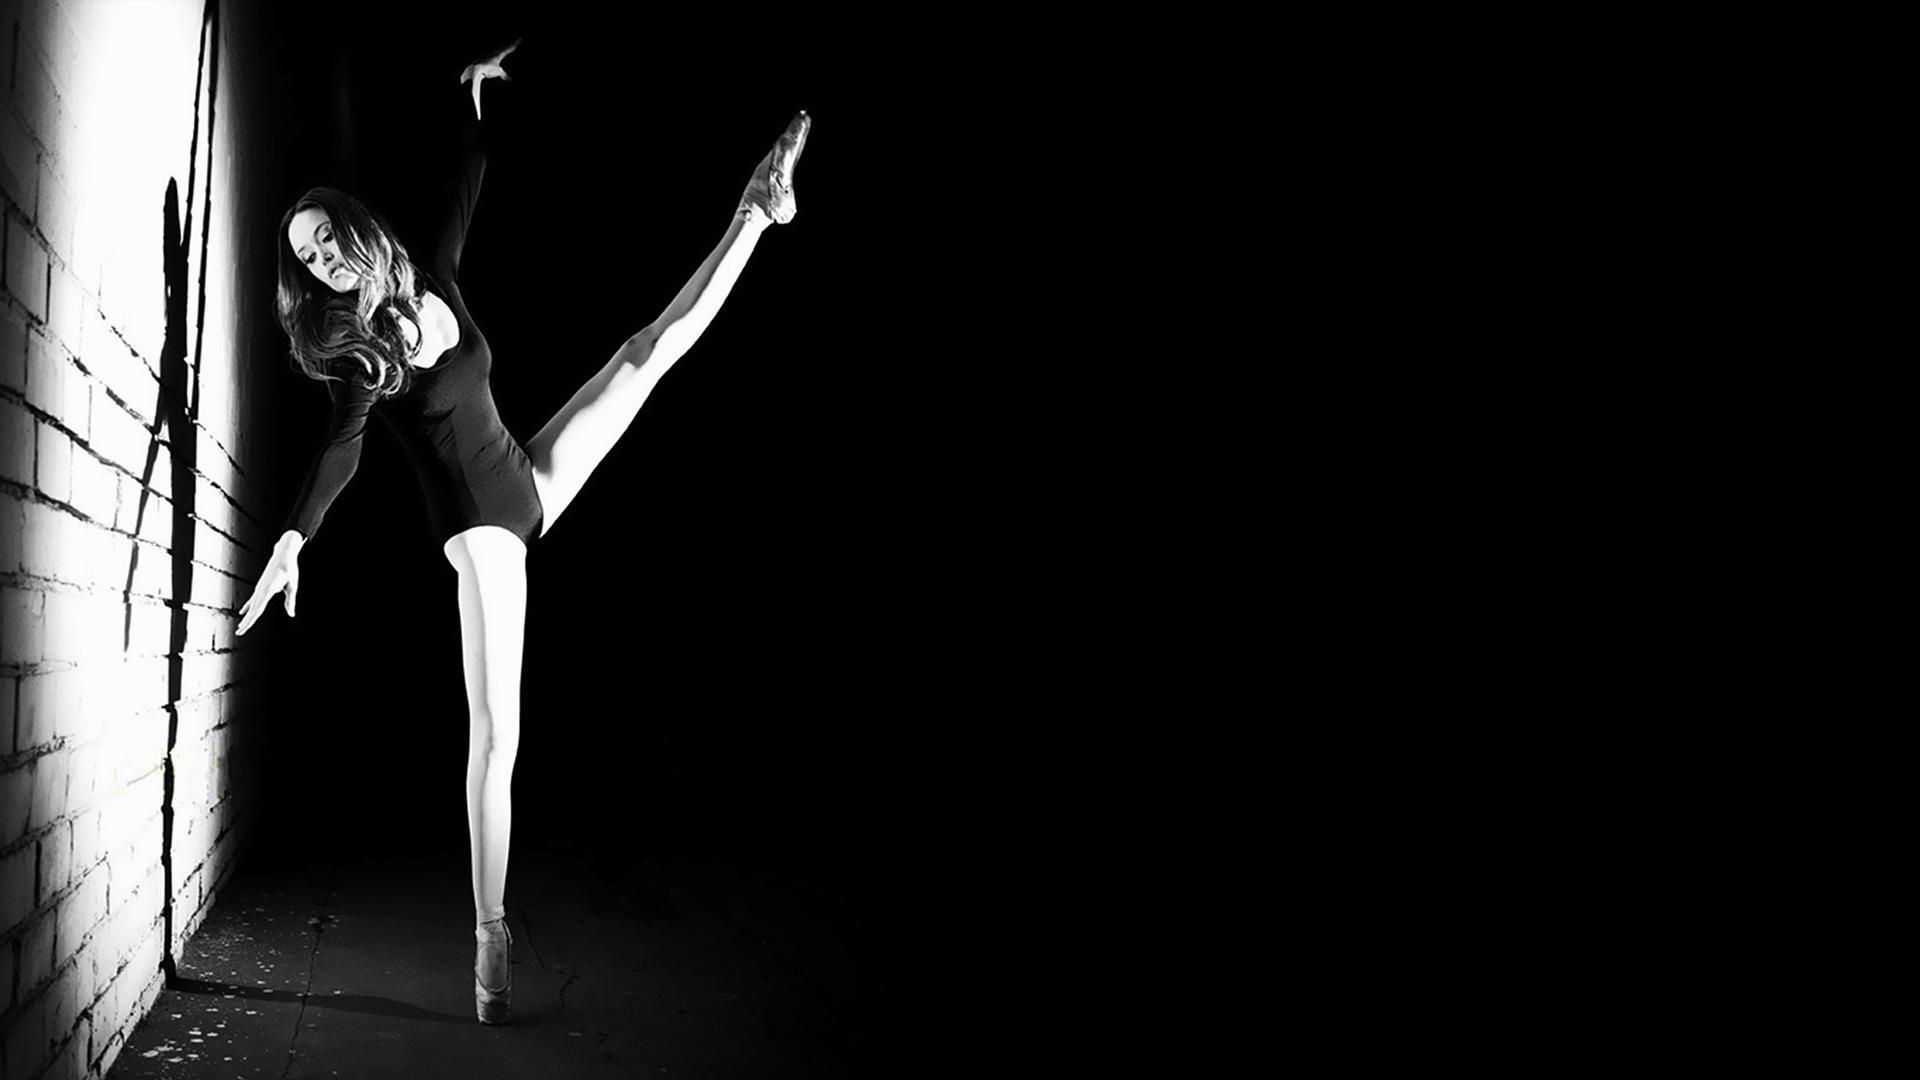 Ballet Dance Wallpapers Hd Resolution Dodskypict: Ballet Wallpapers (61+ Images